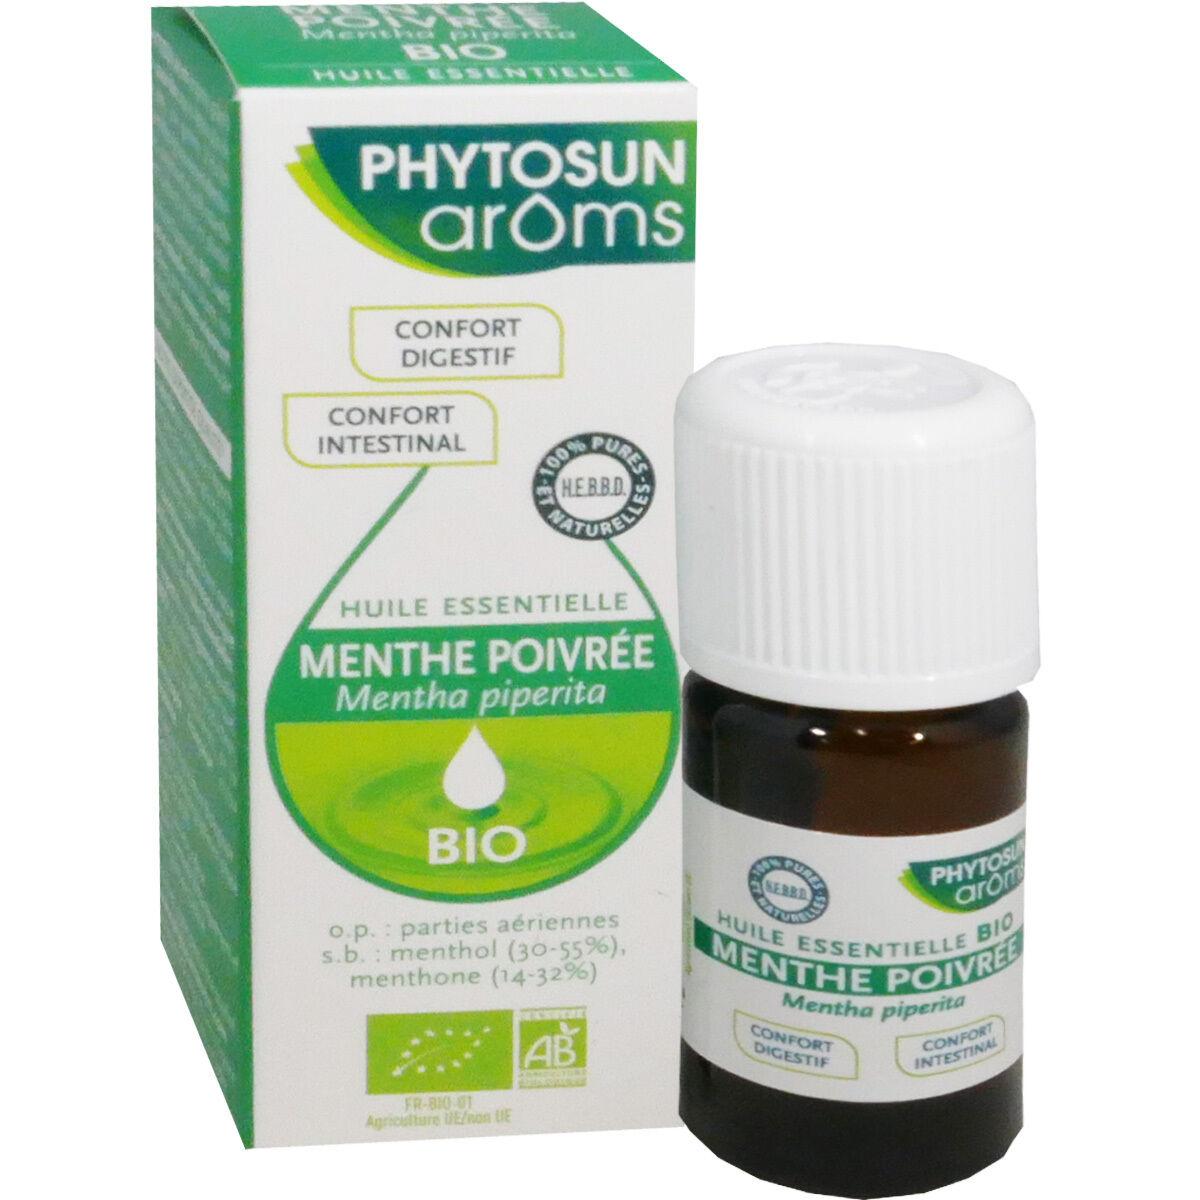 Phytosun aroms huile essentielle menthe poivree digestion 10 ml